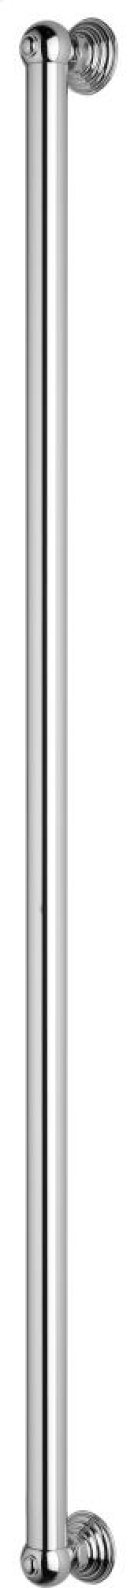 "Polished Chrome 42"" Decorative Grab Bar Product Image"